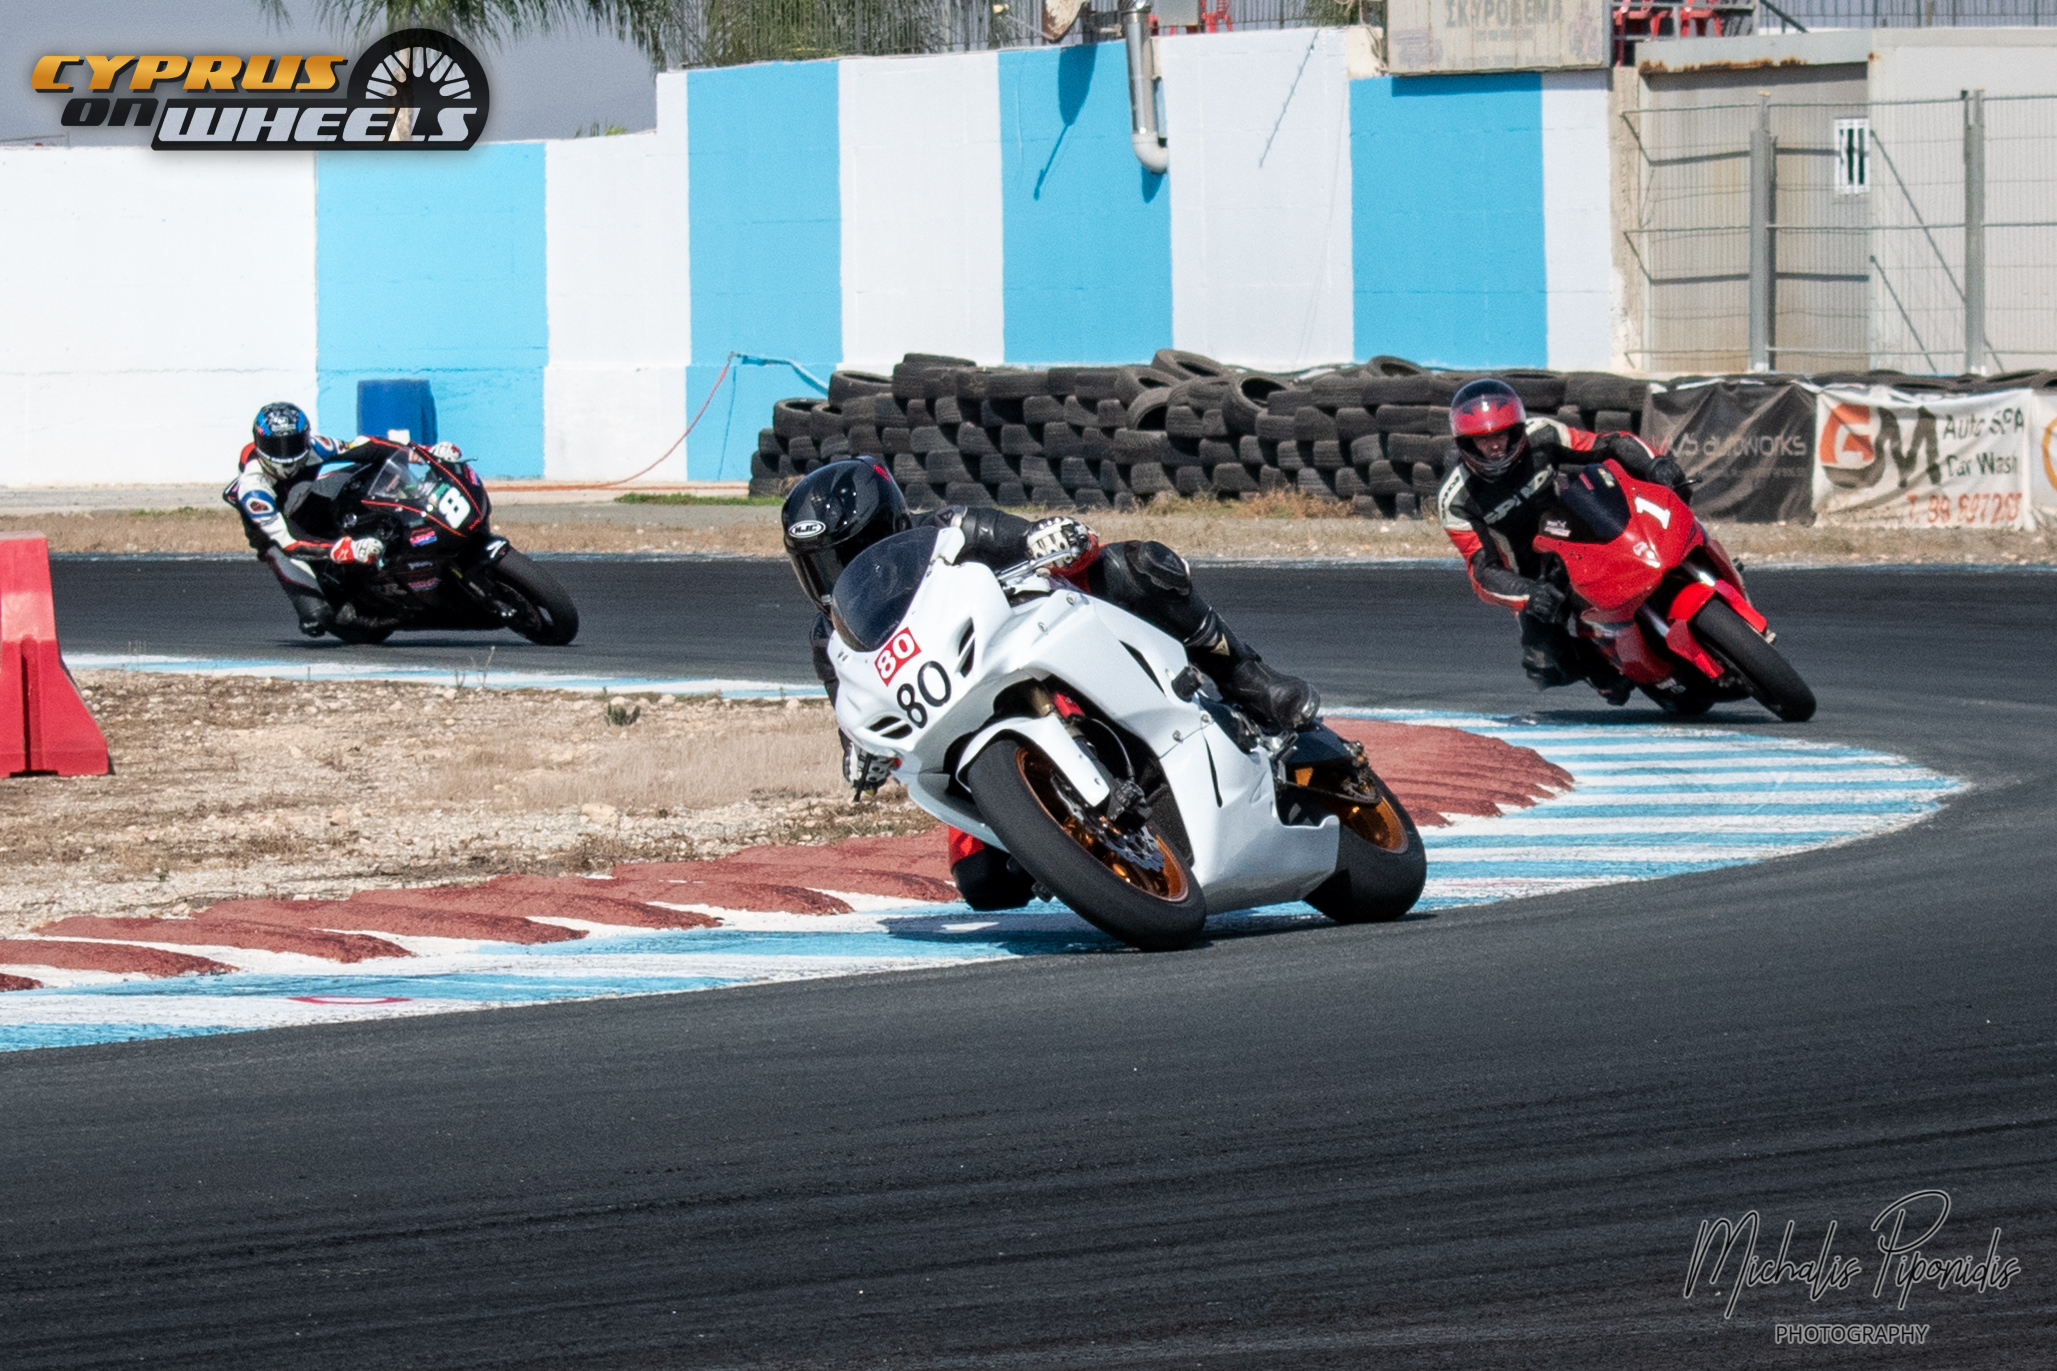 White gsxr racing